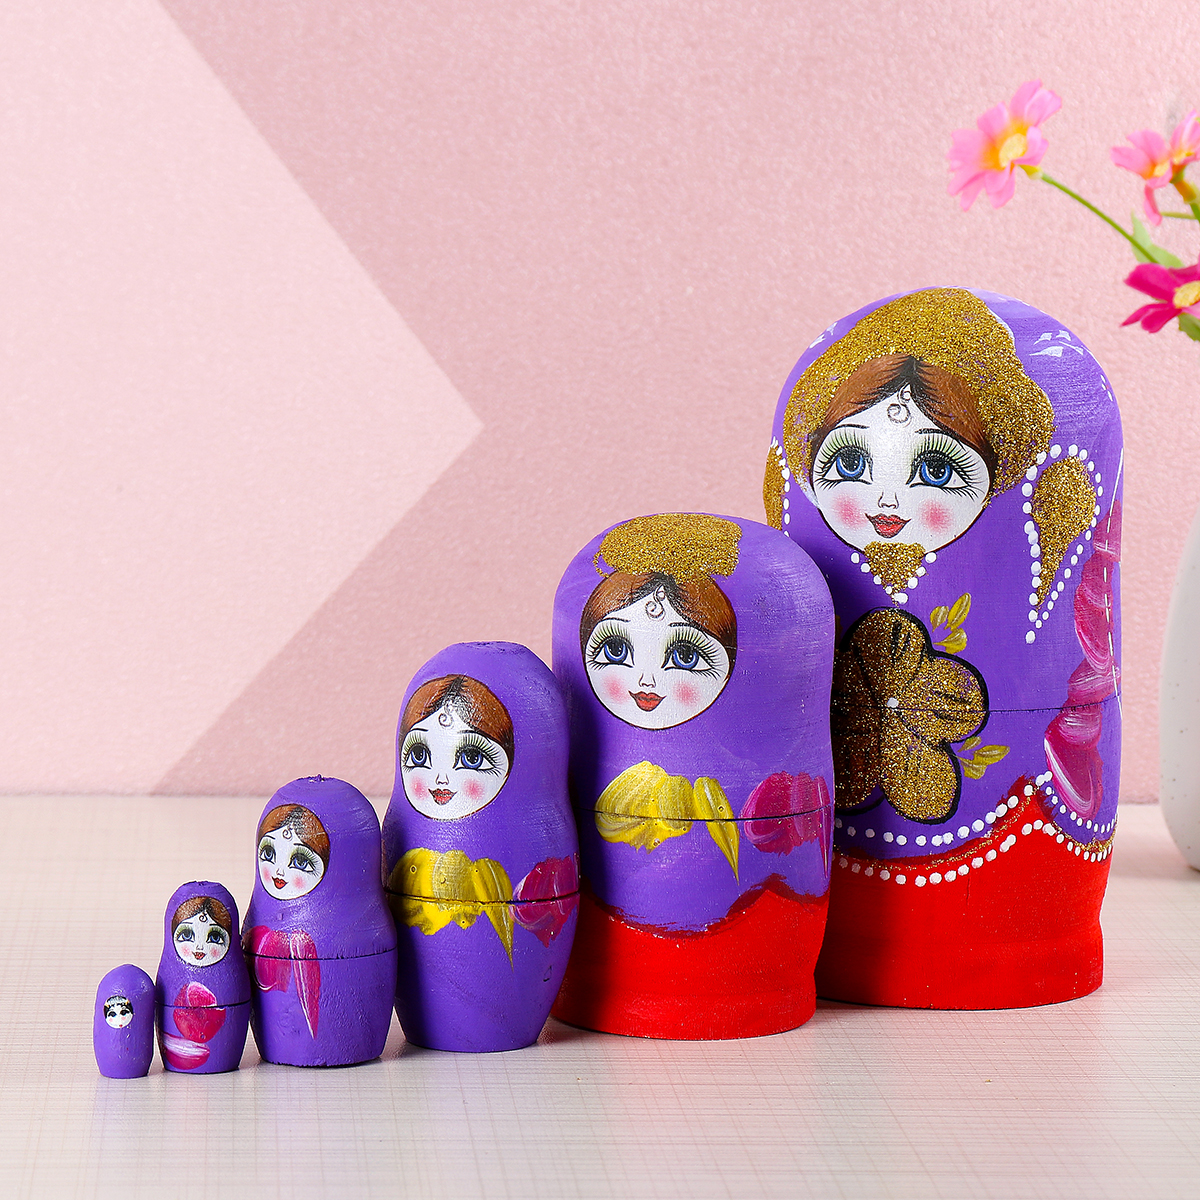 "10 Wood Russian Matryoshka Nesting Dolls Hand Paint Gift Room Desk Decor Pink 6/"""